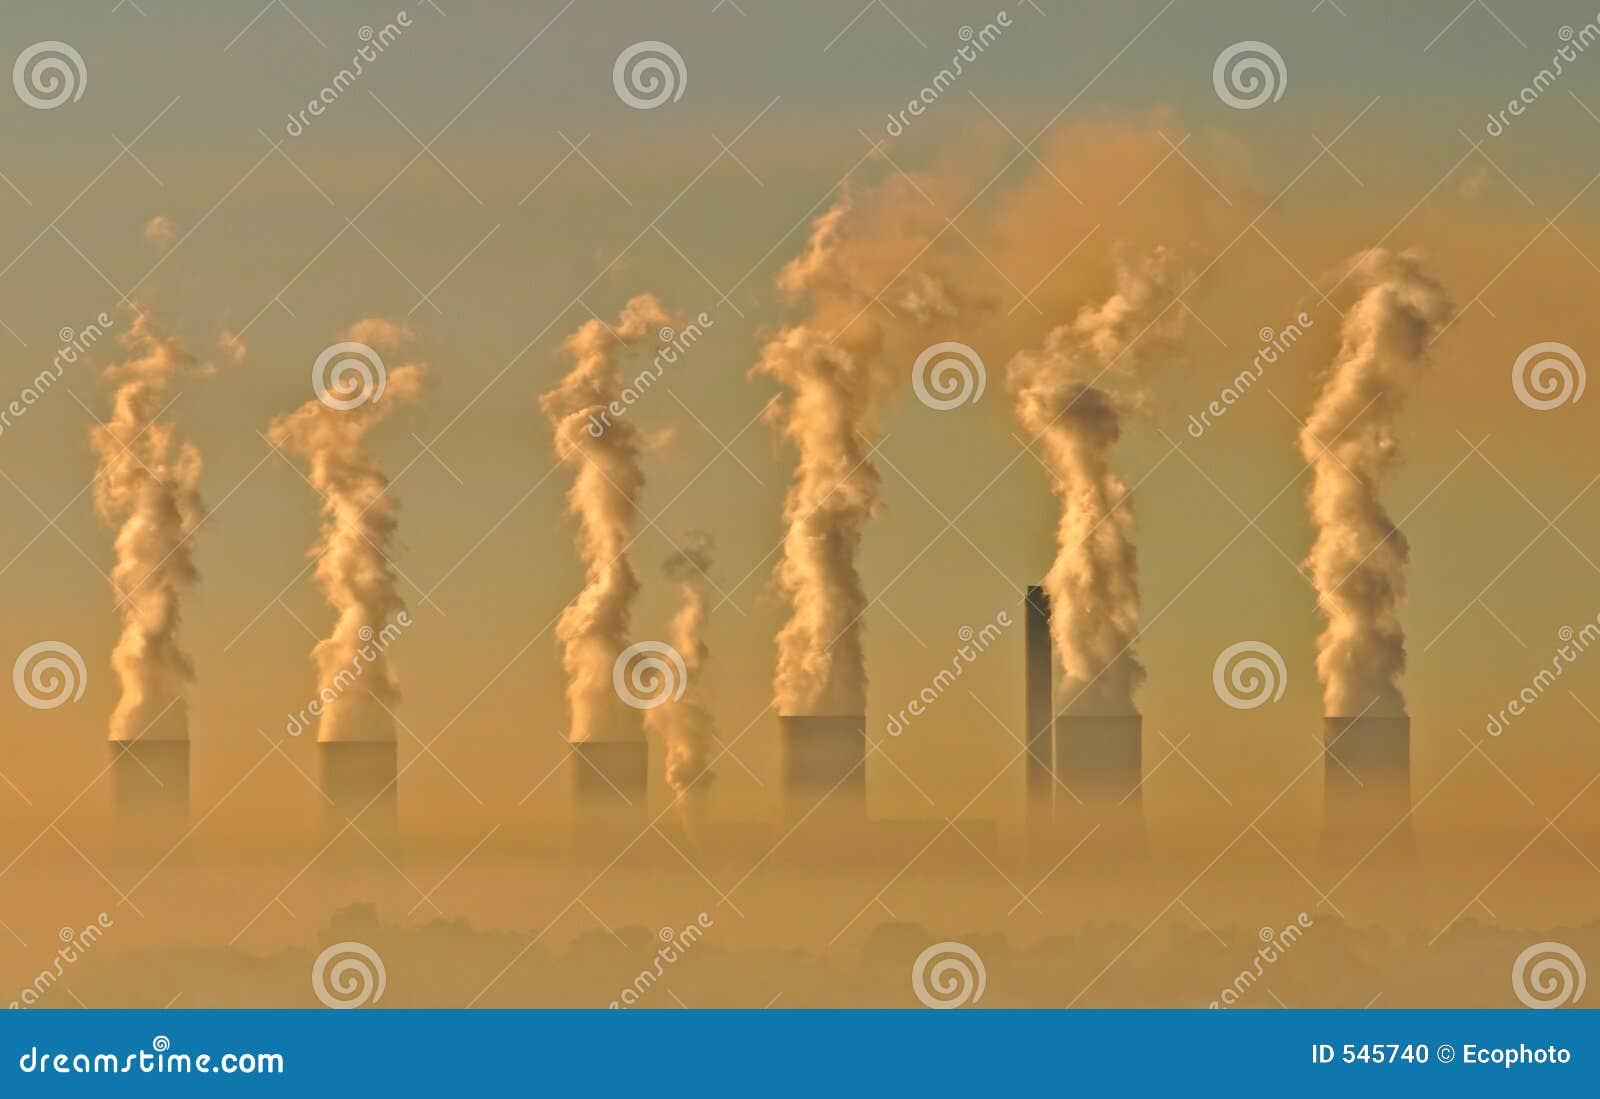 Download 行业烟雾 库存照片. 图片 包括有 蒸汽, 结构, 全球, 烟雾, 烧伤, 进程, 催化作用, 不健康, 岗位 - 545740